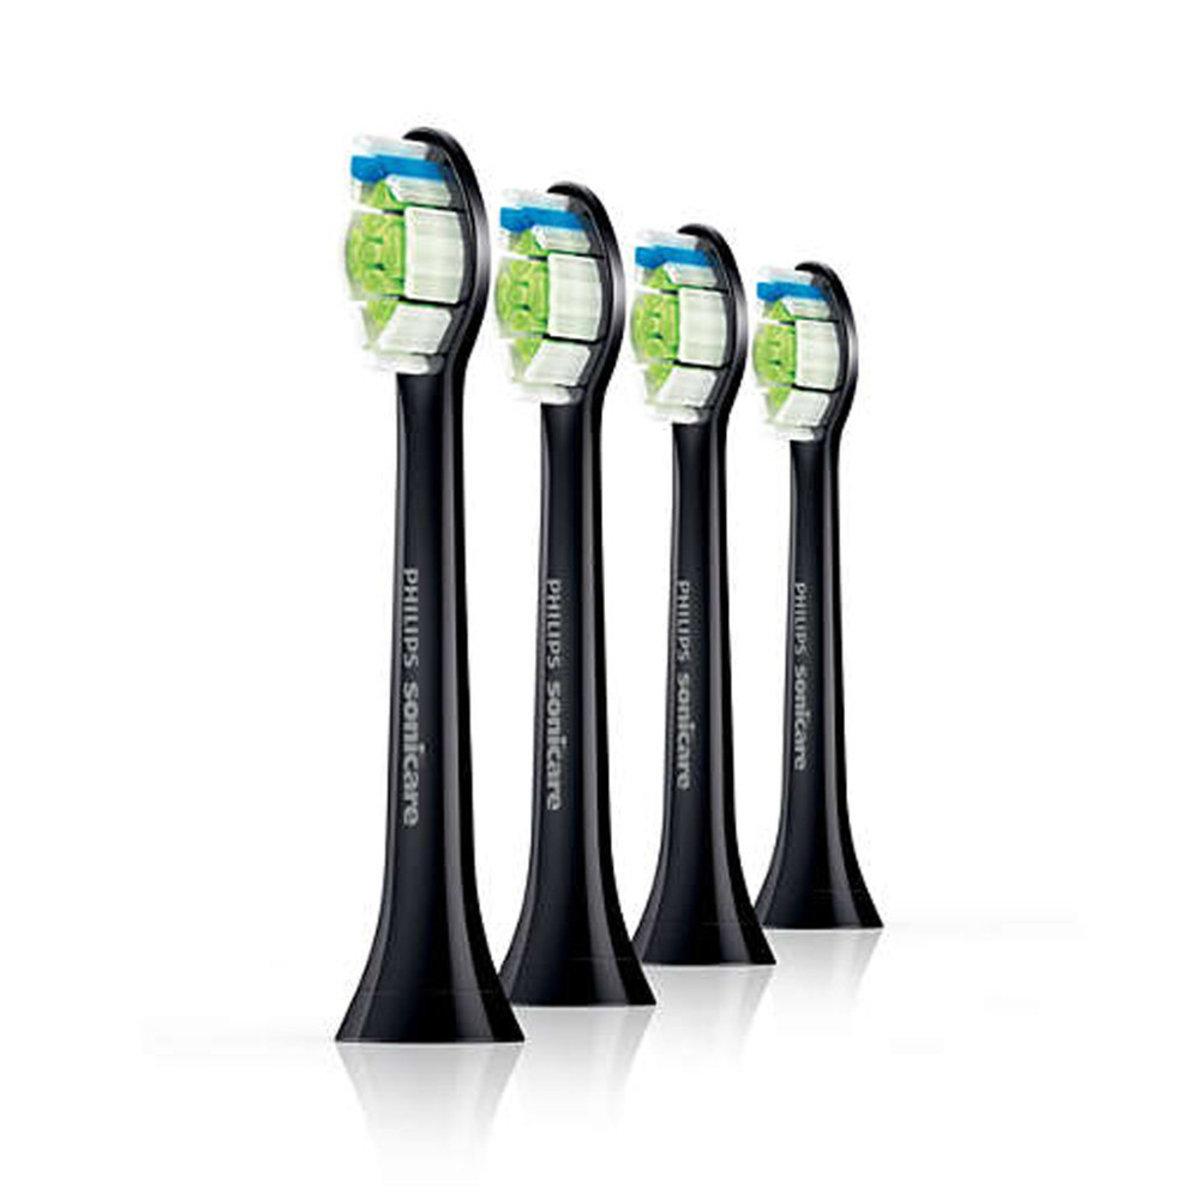 Sonicare DiamondClean Toothbrush Head - HX6064 (Black) (4pcs)